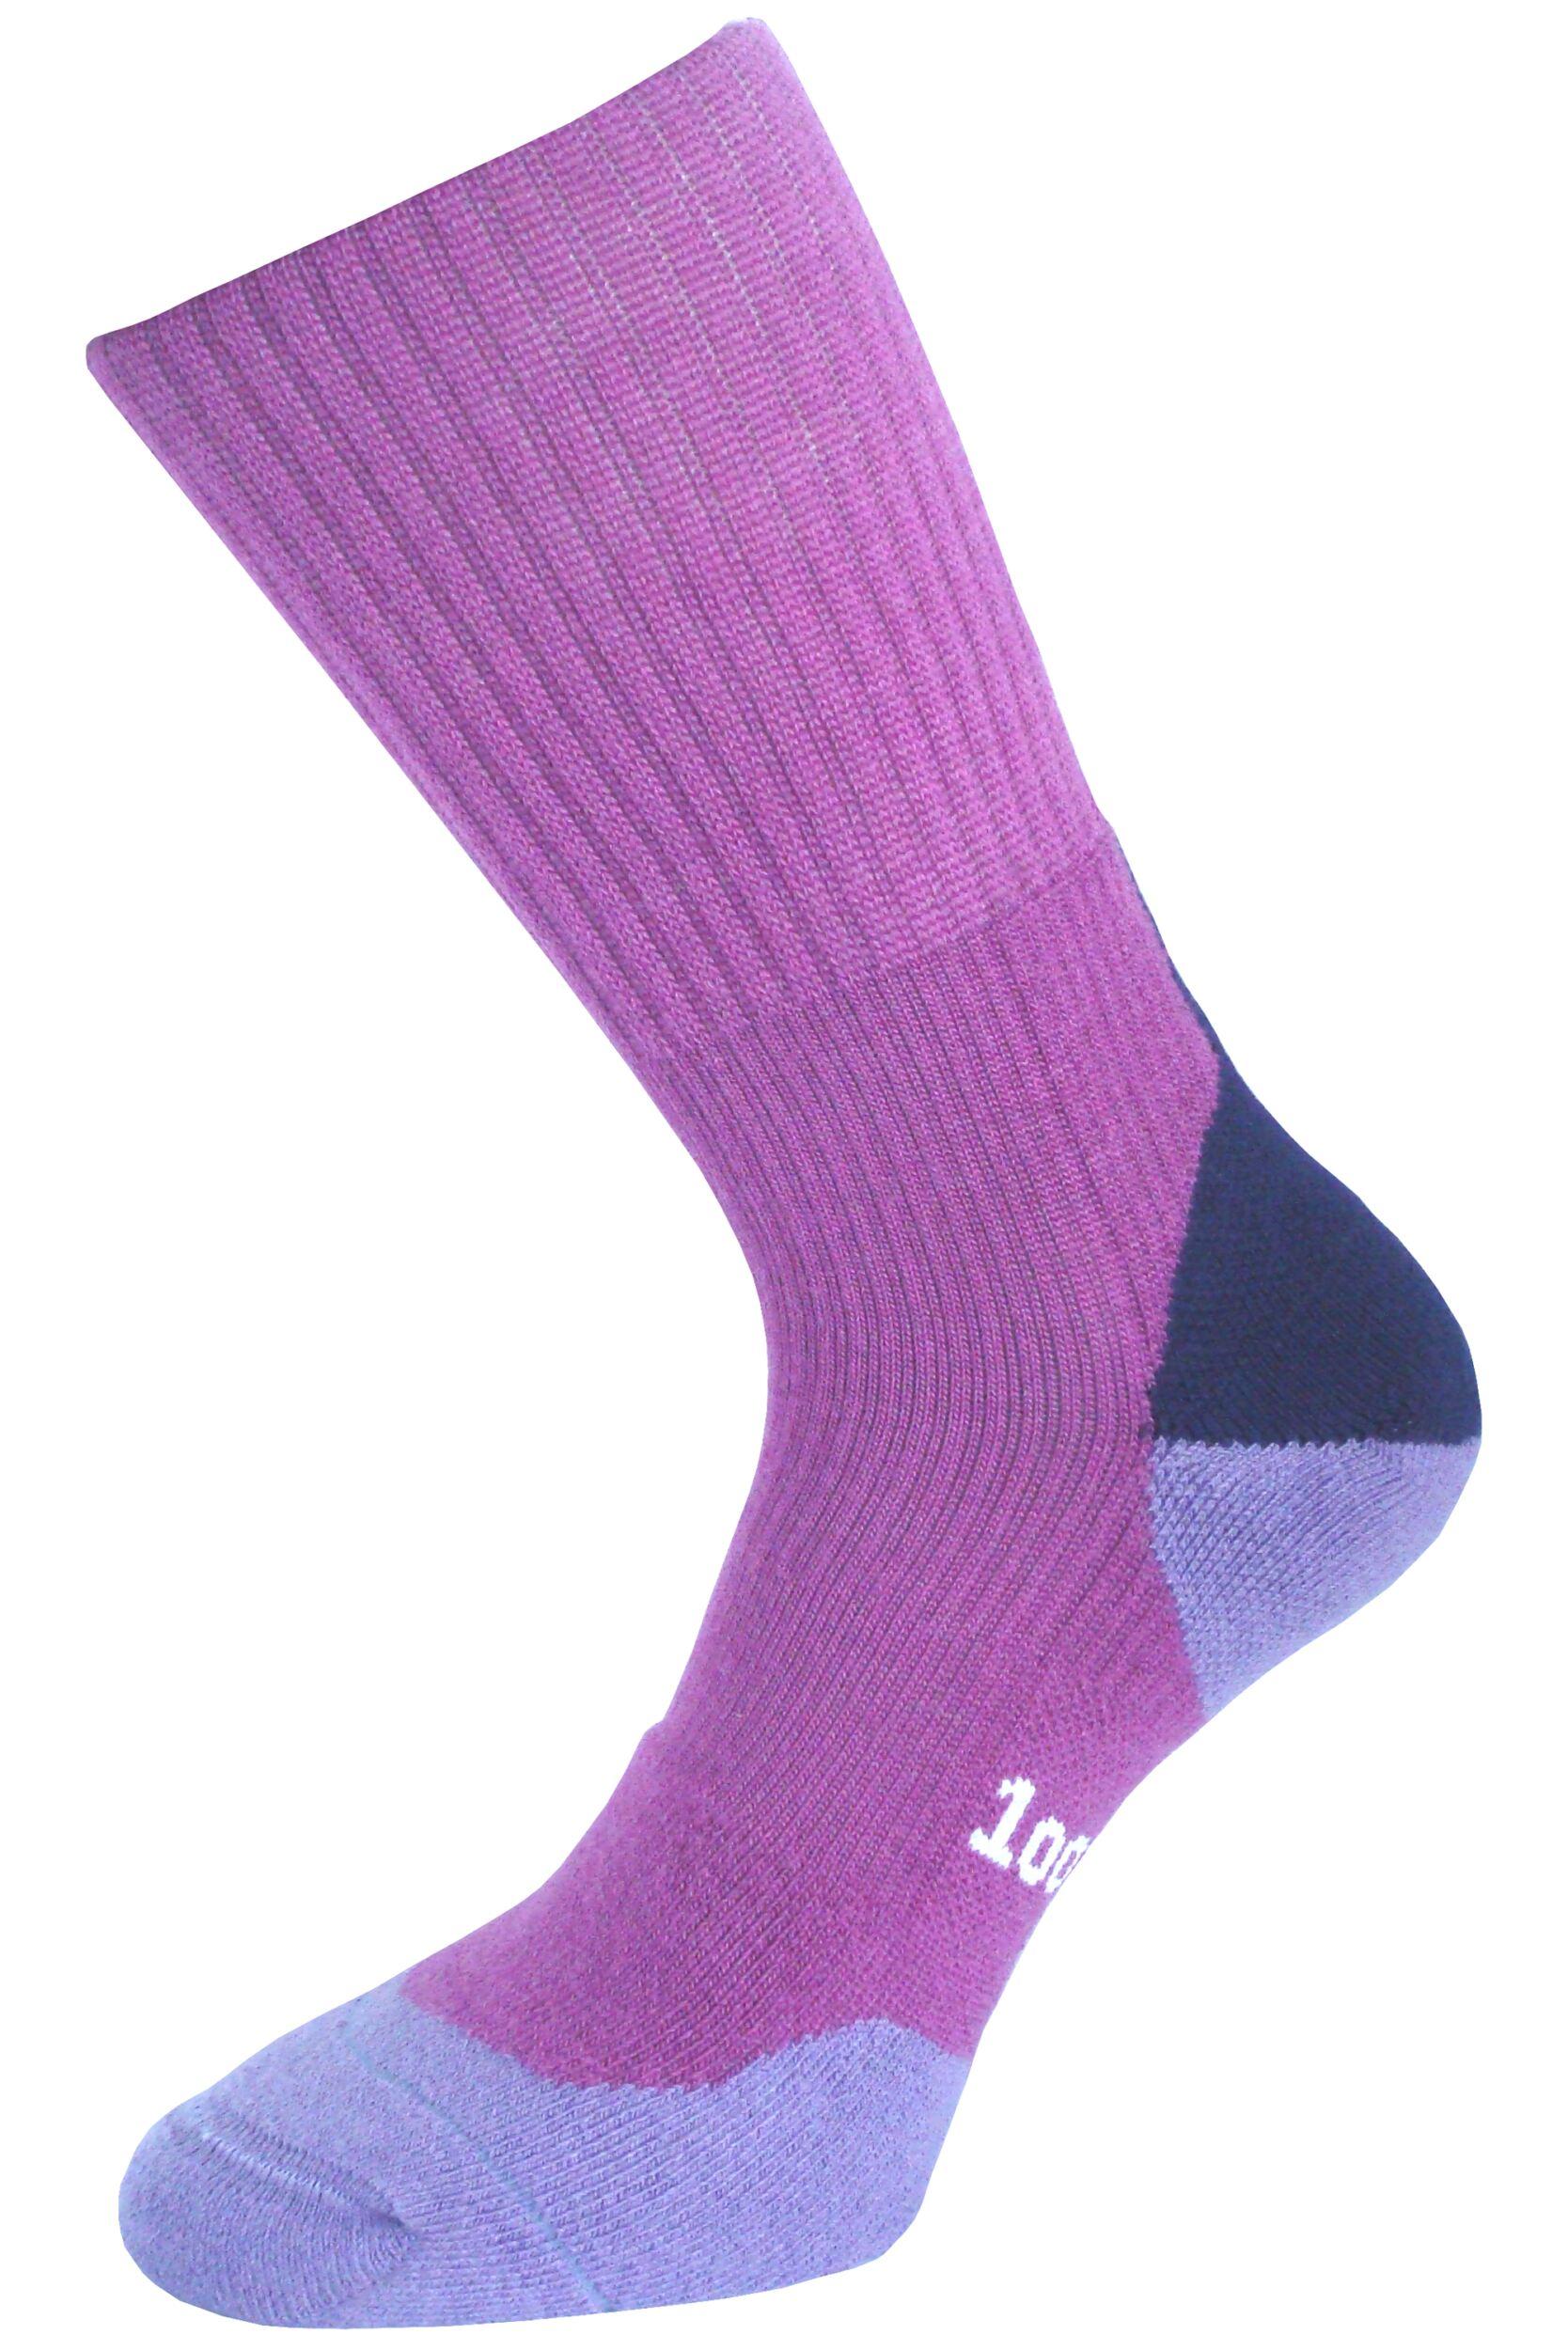 Image of Ladies 1 Pair 1000 Mile 'Tactel' Fusion Walking Sock